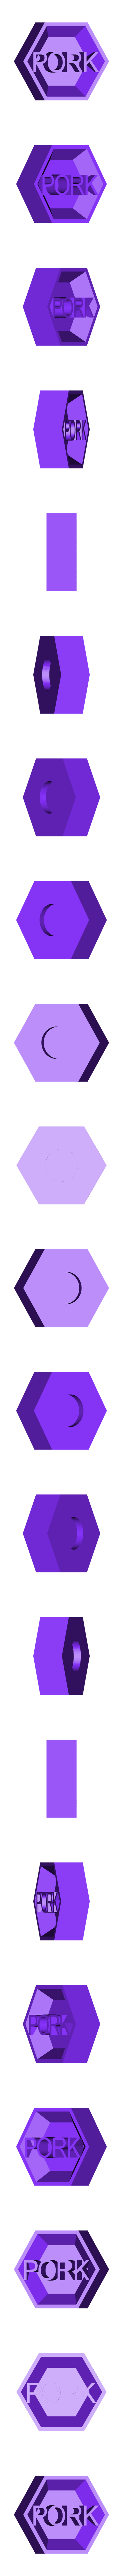 PORK.stl Download free STL file Busy Bee • Object to 3D print, WallTosh